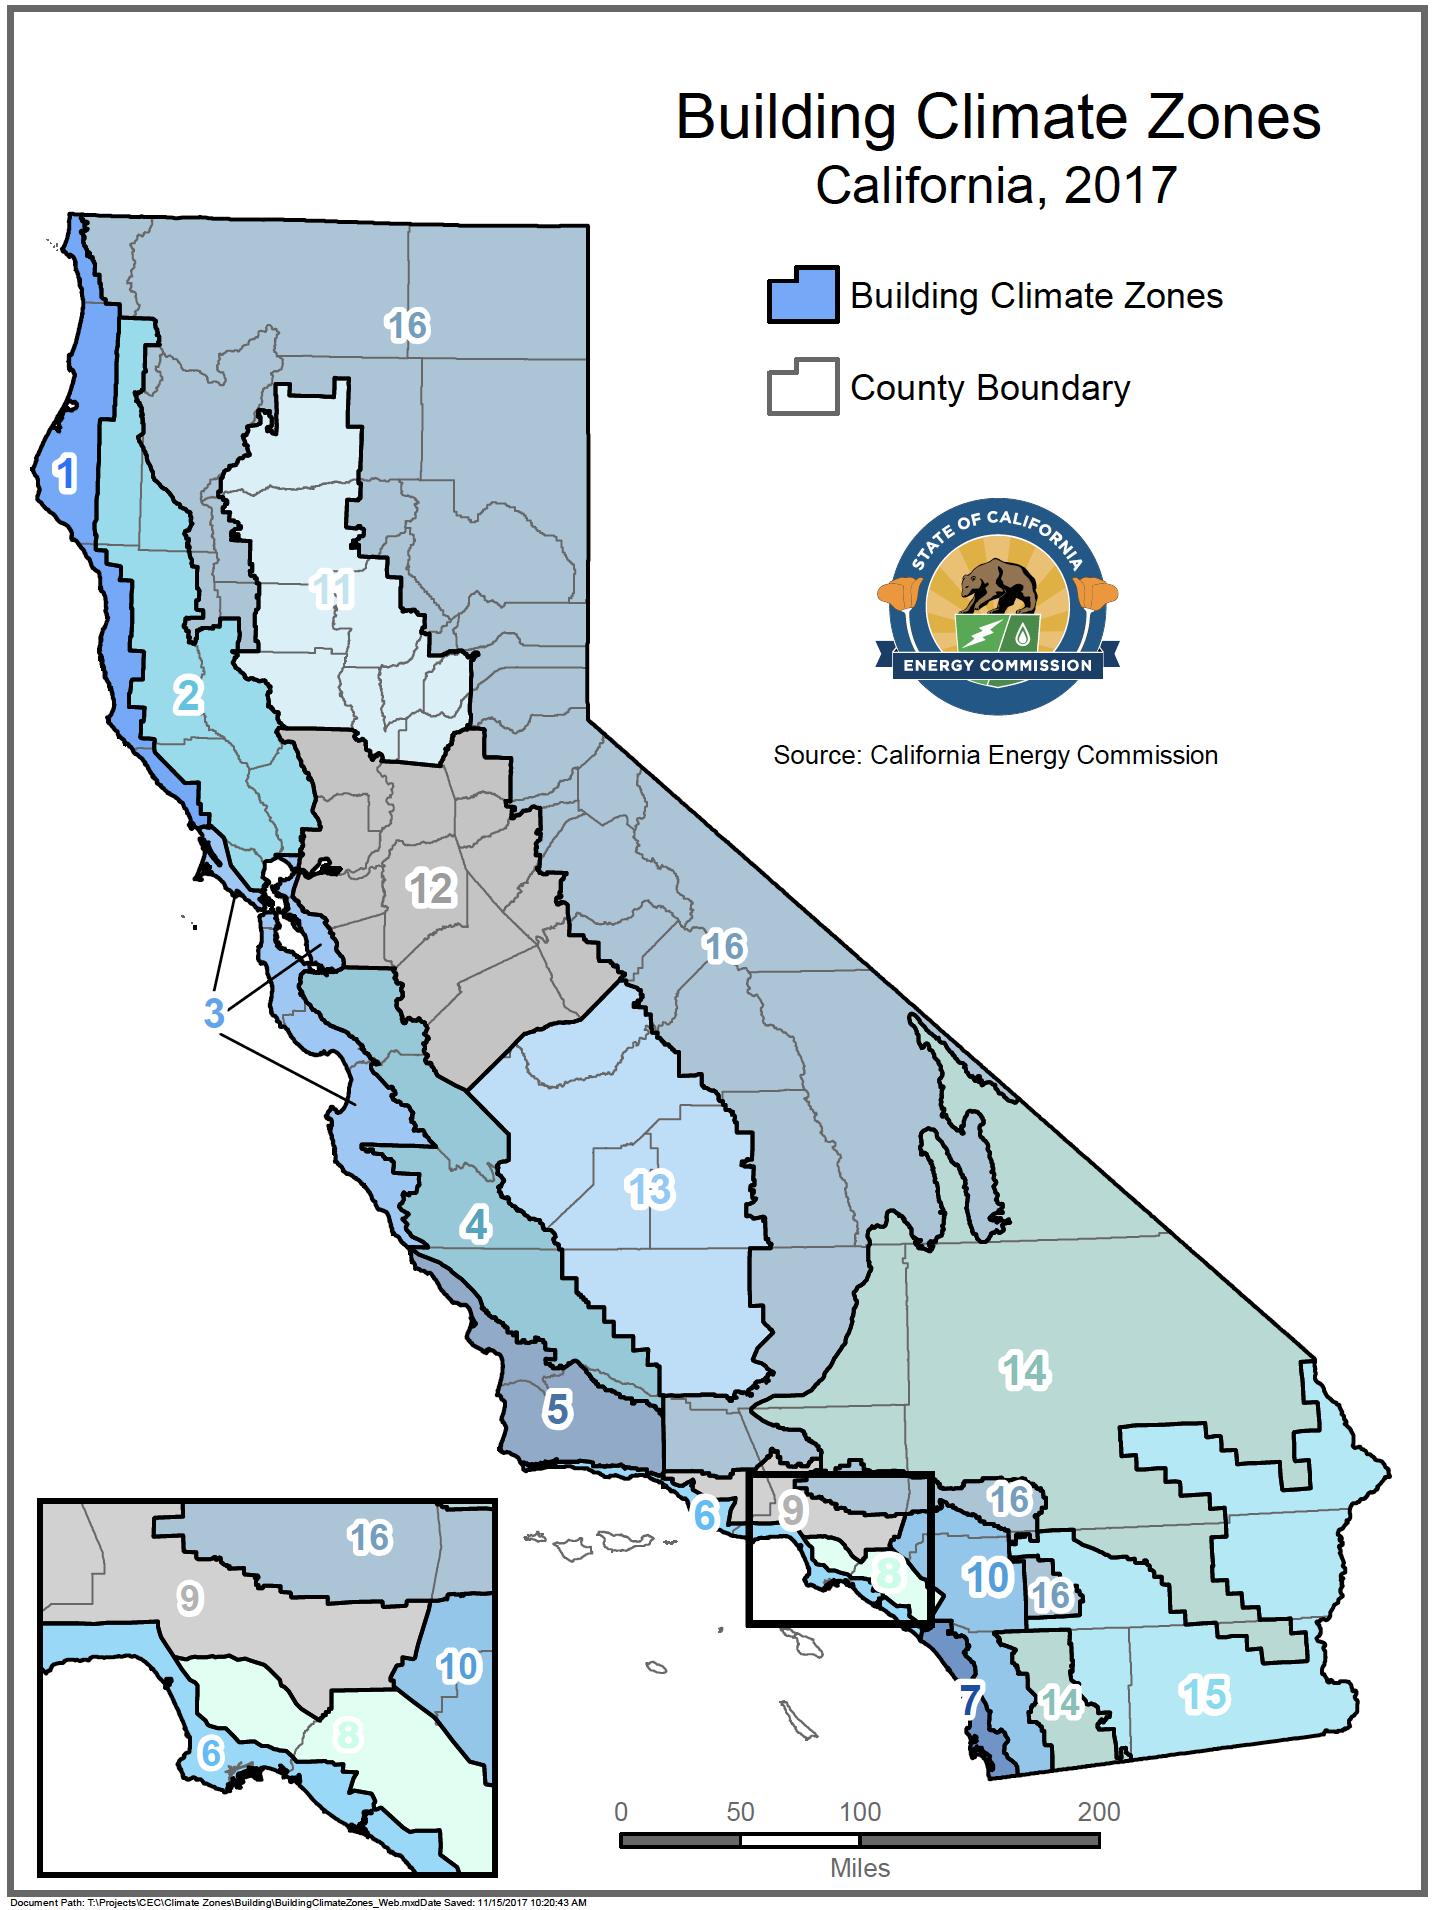 Energy Maps of California - Califonia Energy Commission